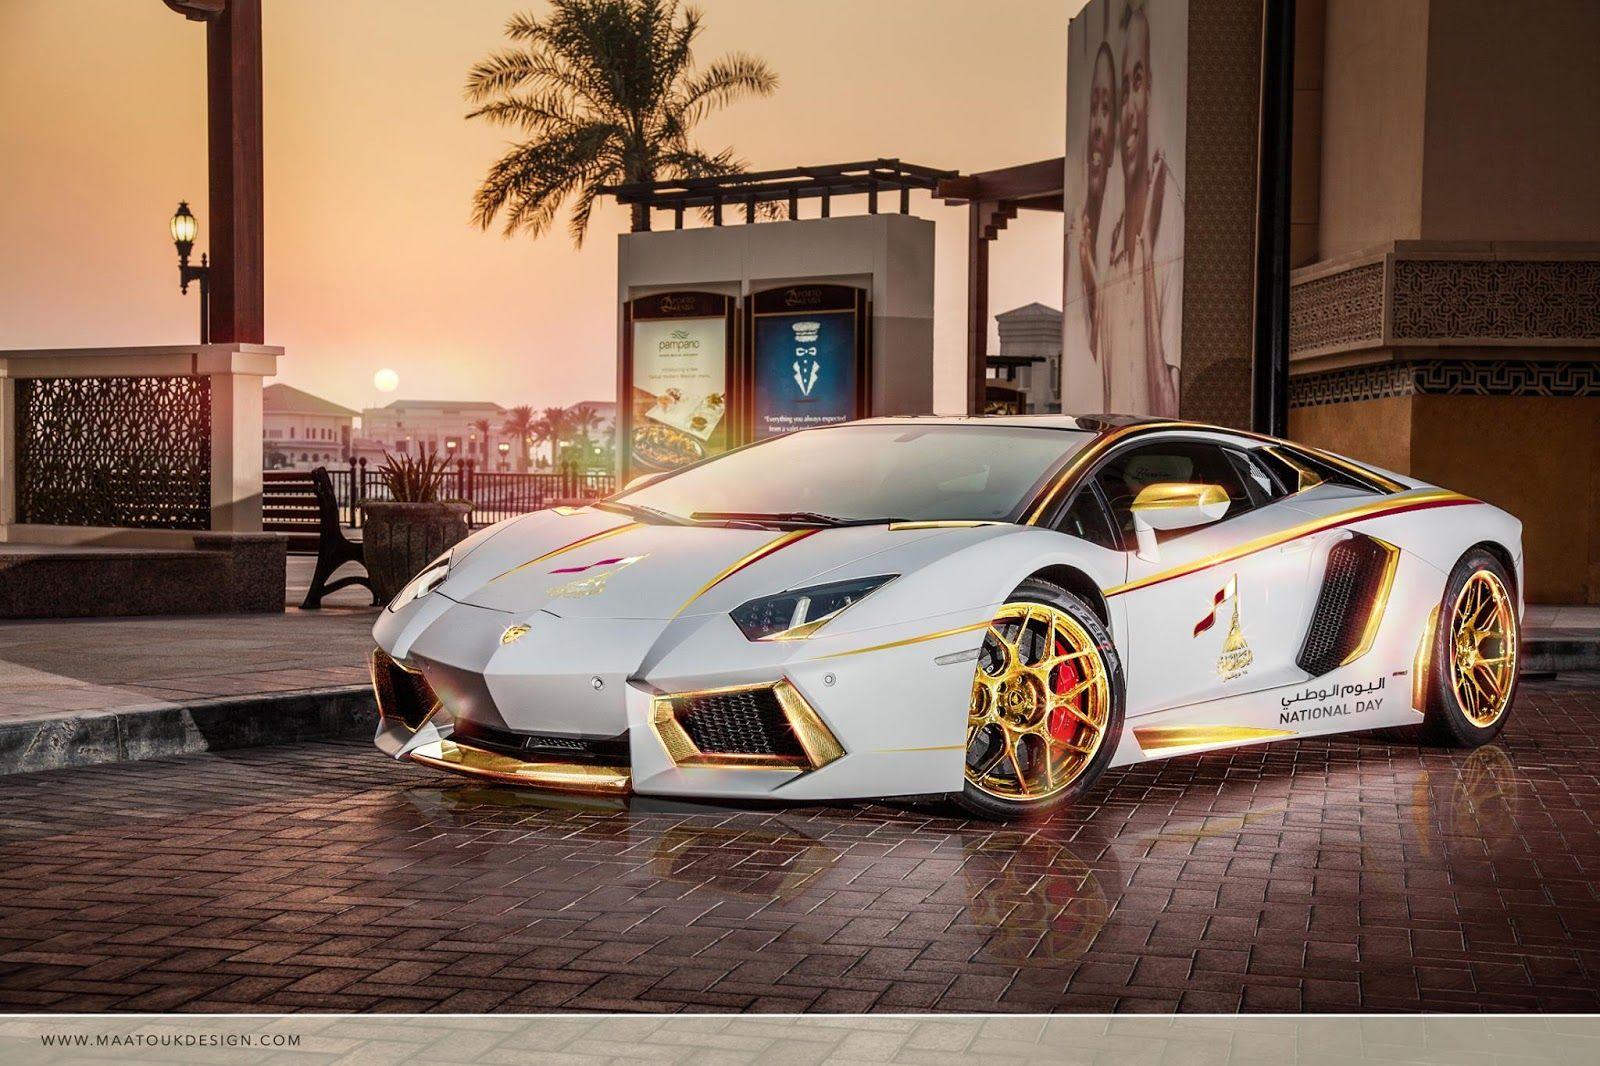 Gold Plated Lamborghini Aventador Is 1 Of 1 W Video Sports Cars Luxury Lamborghini Aventador Roadster Lamborghini Aventador